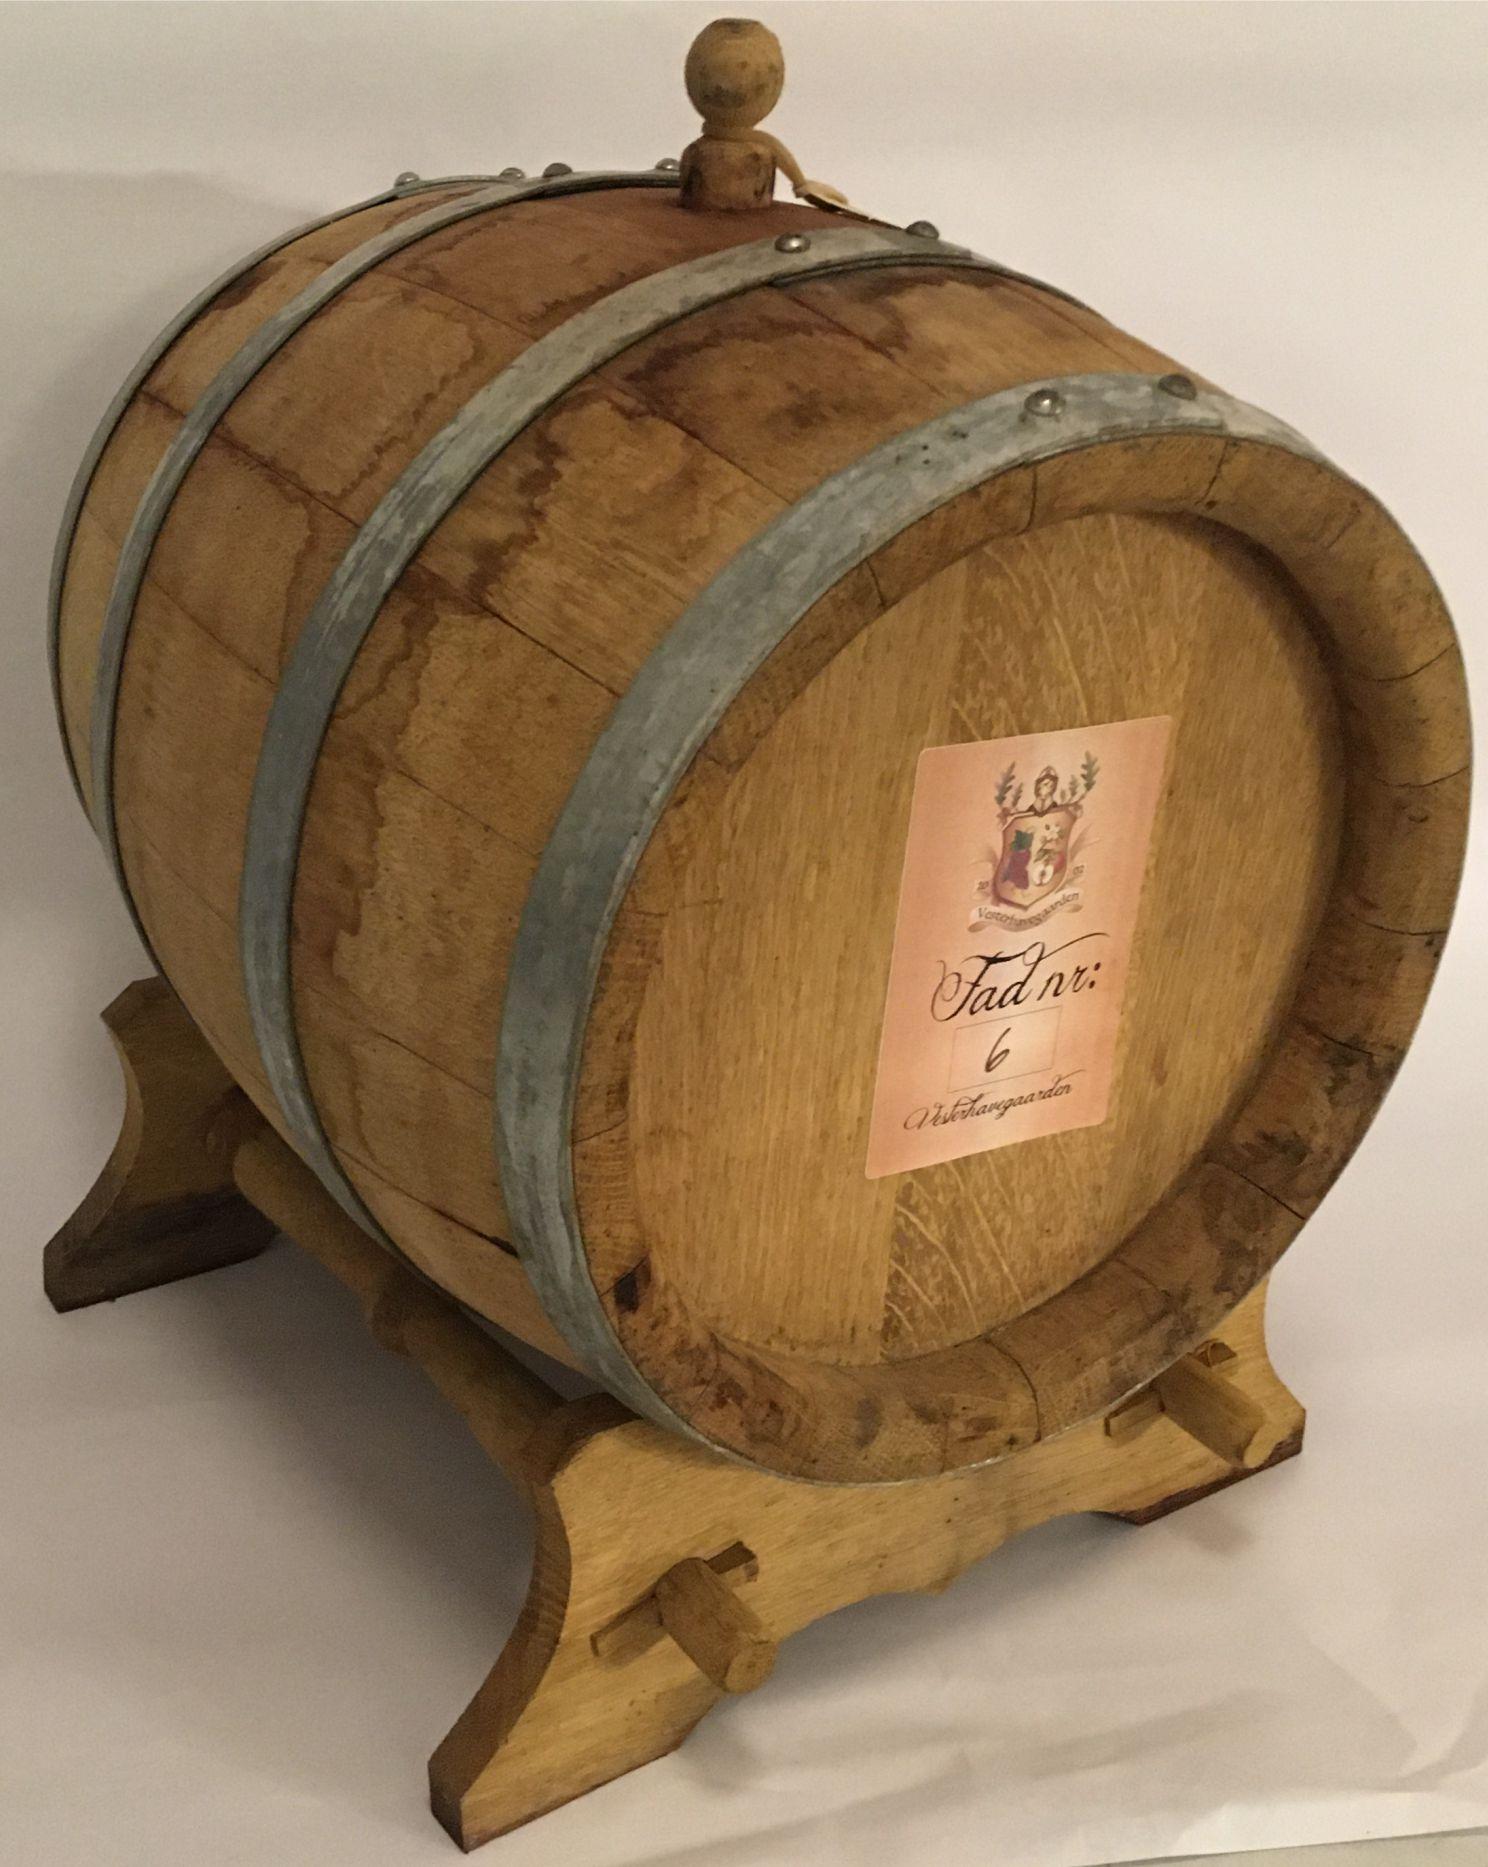 DRAM, EGETRÆS FAD 5 ltr Brandy, 1 år gl